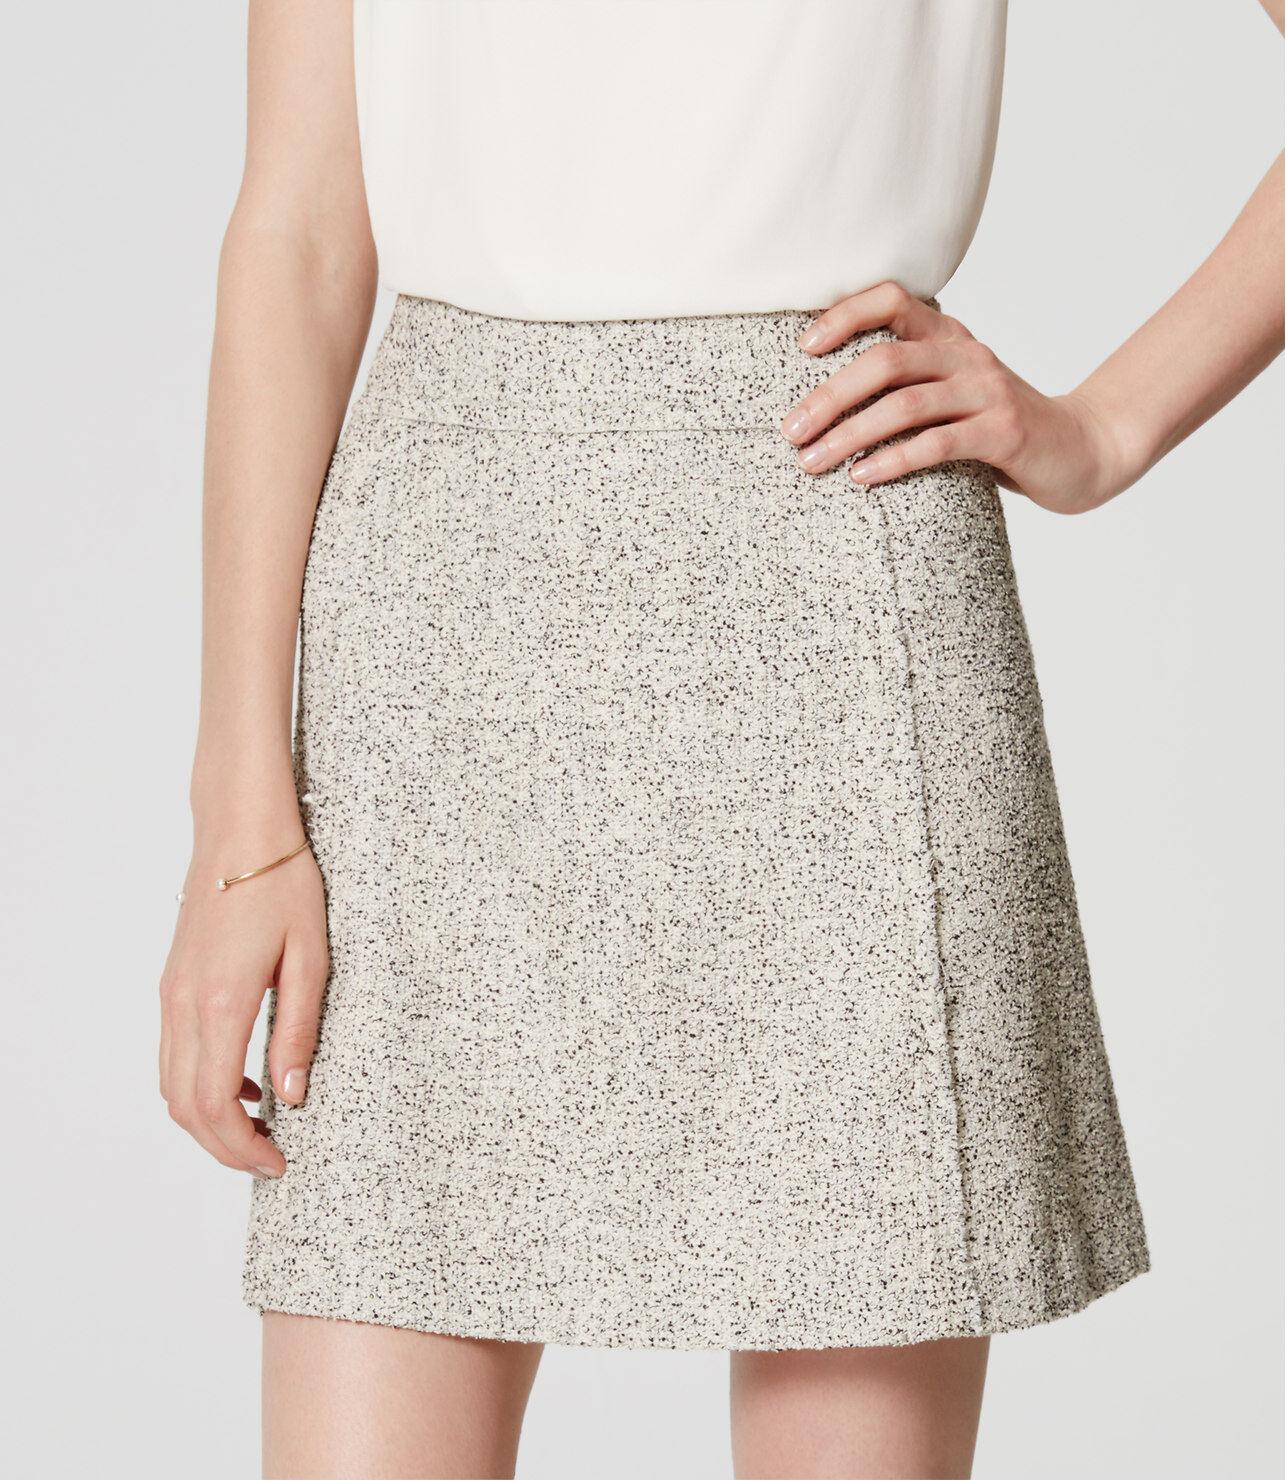 Ann Taylor LOFT Edged Tweed Skirt Size 8 Tall NWT Whisper White color